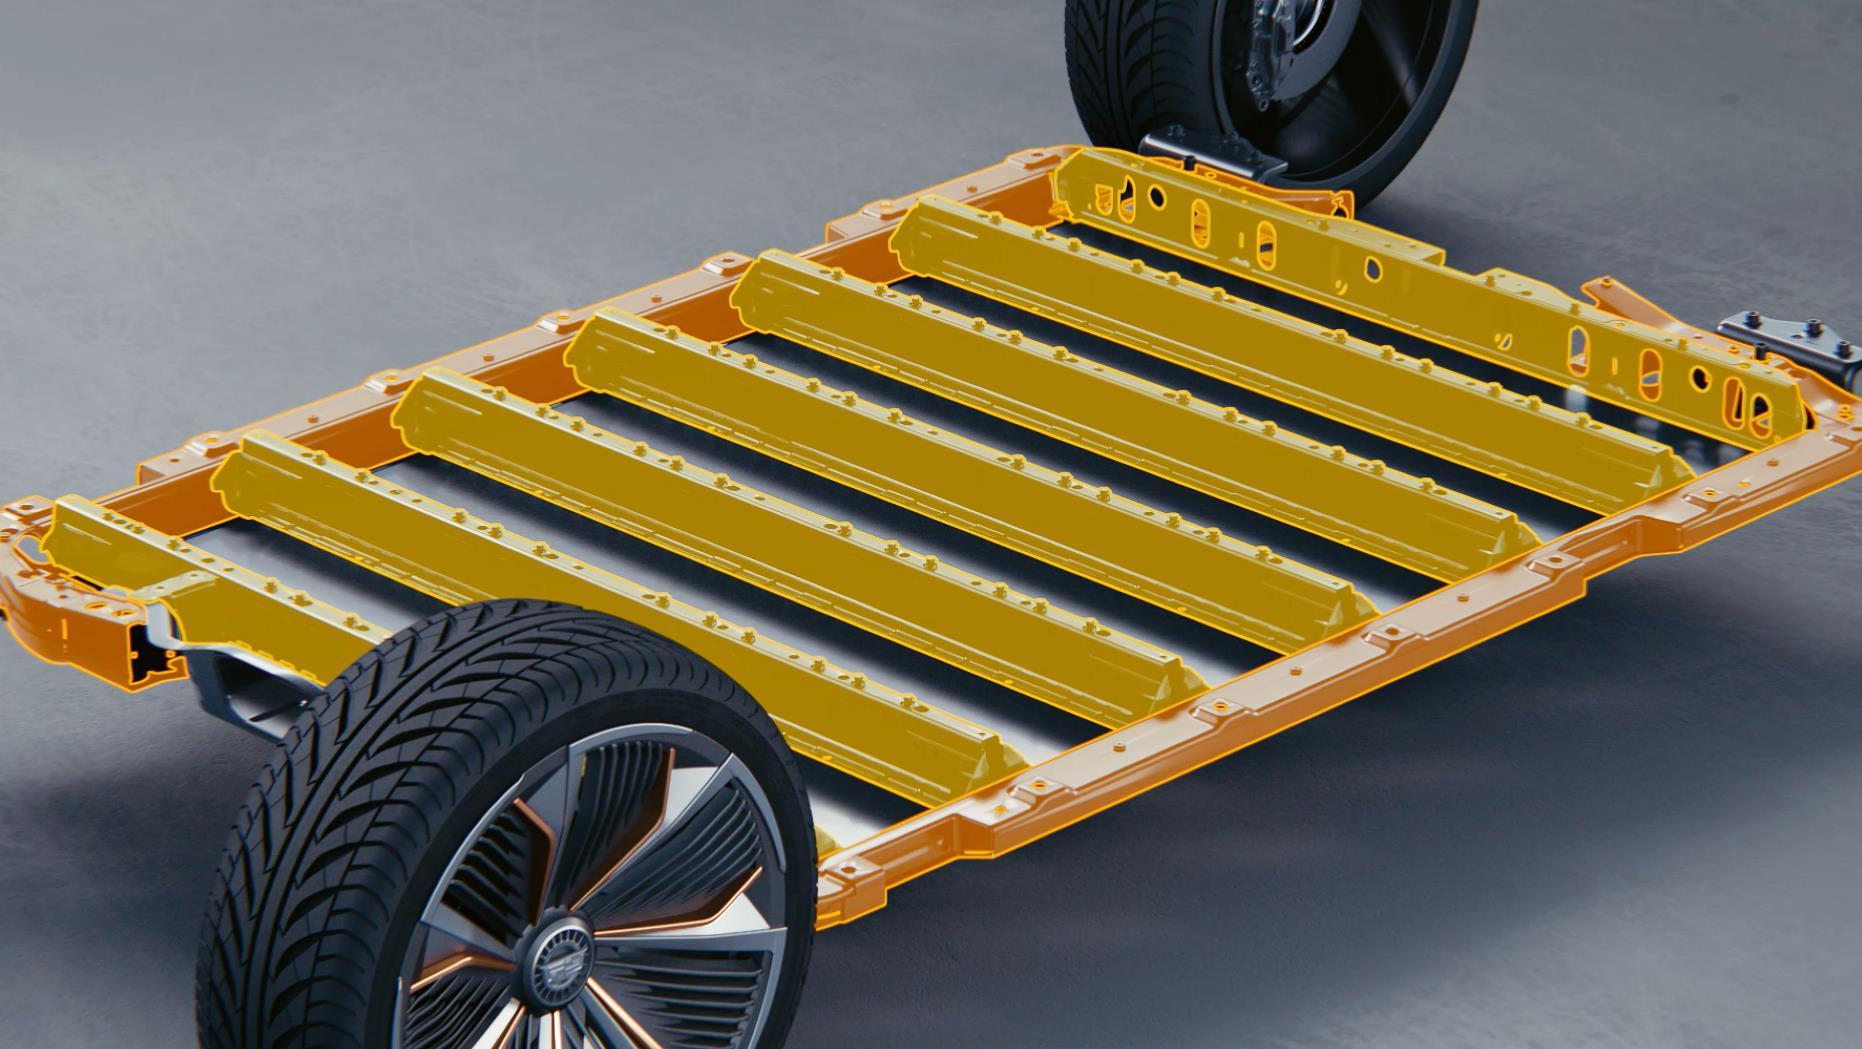 Ultium电池包壳体采用超高强度的井字形框架结构